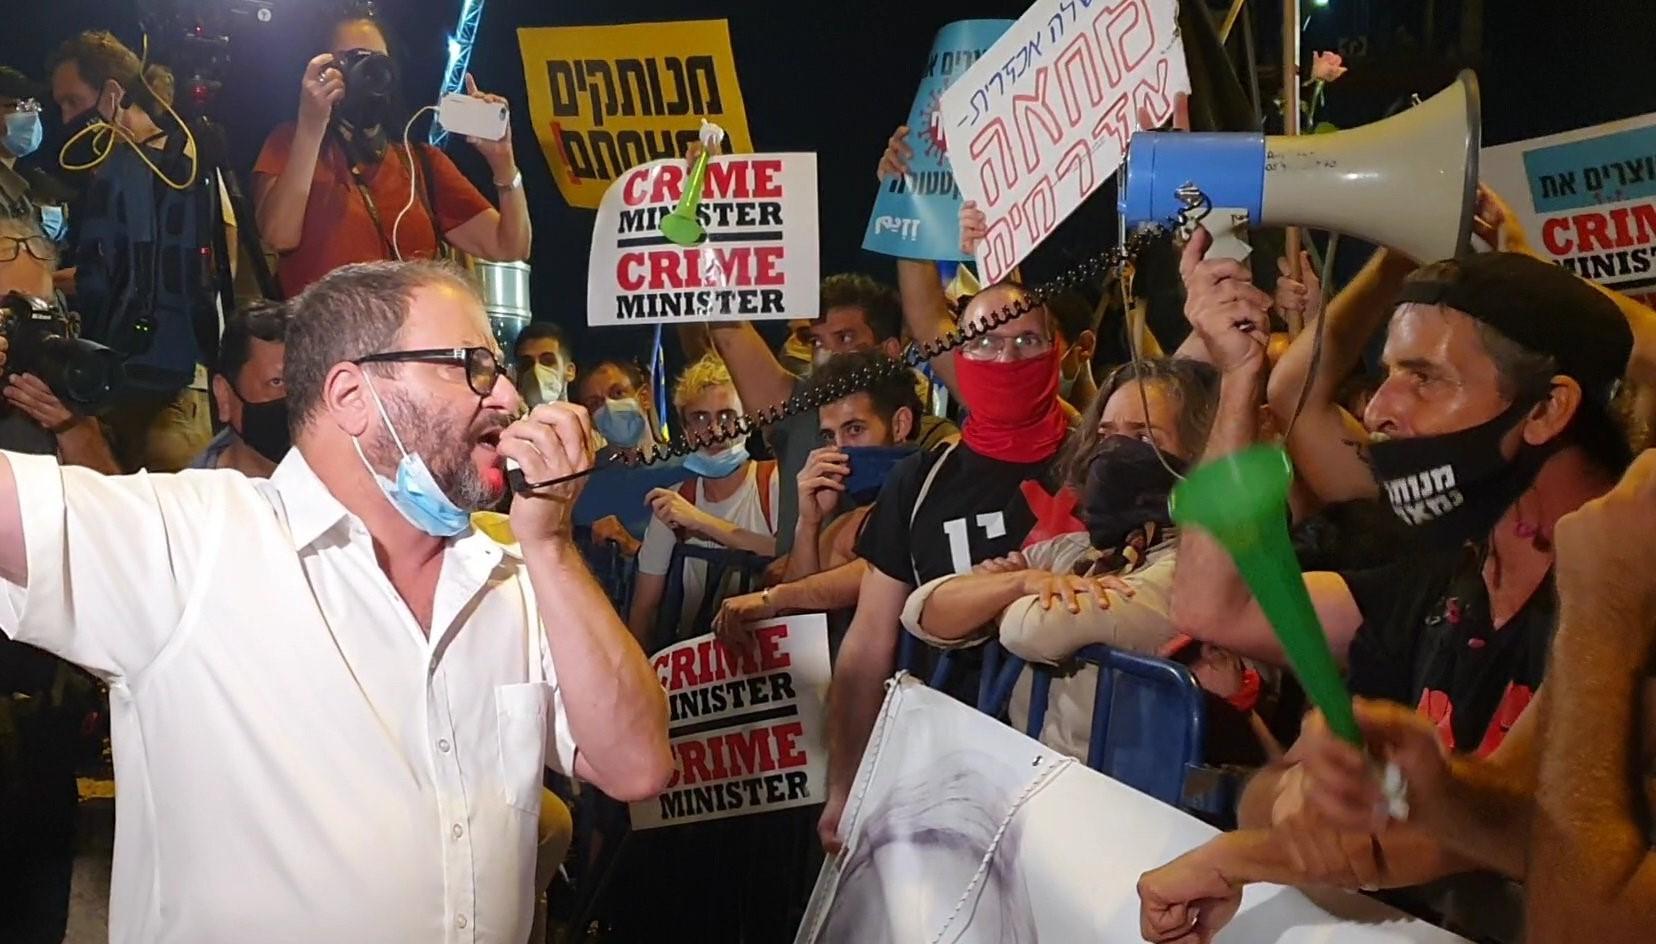 Joint List MK Ofer Cassif (Hadash) addresses demonstrators protesting against Prime Minister Netanyahu in Jerusalem on Tuesday, July 21.